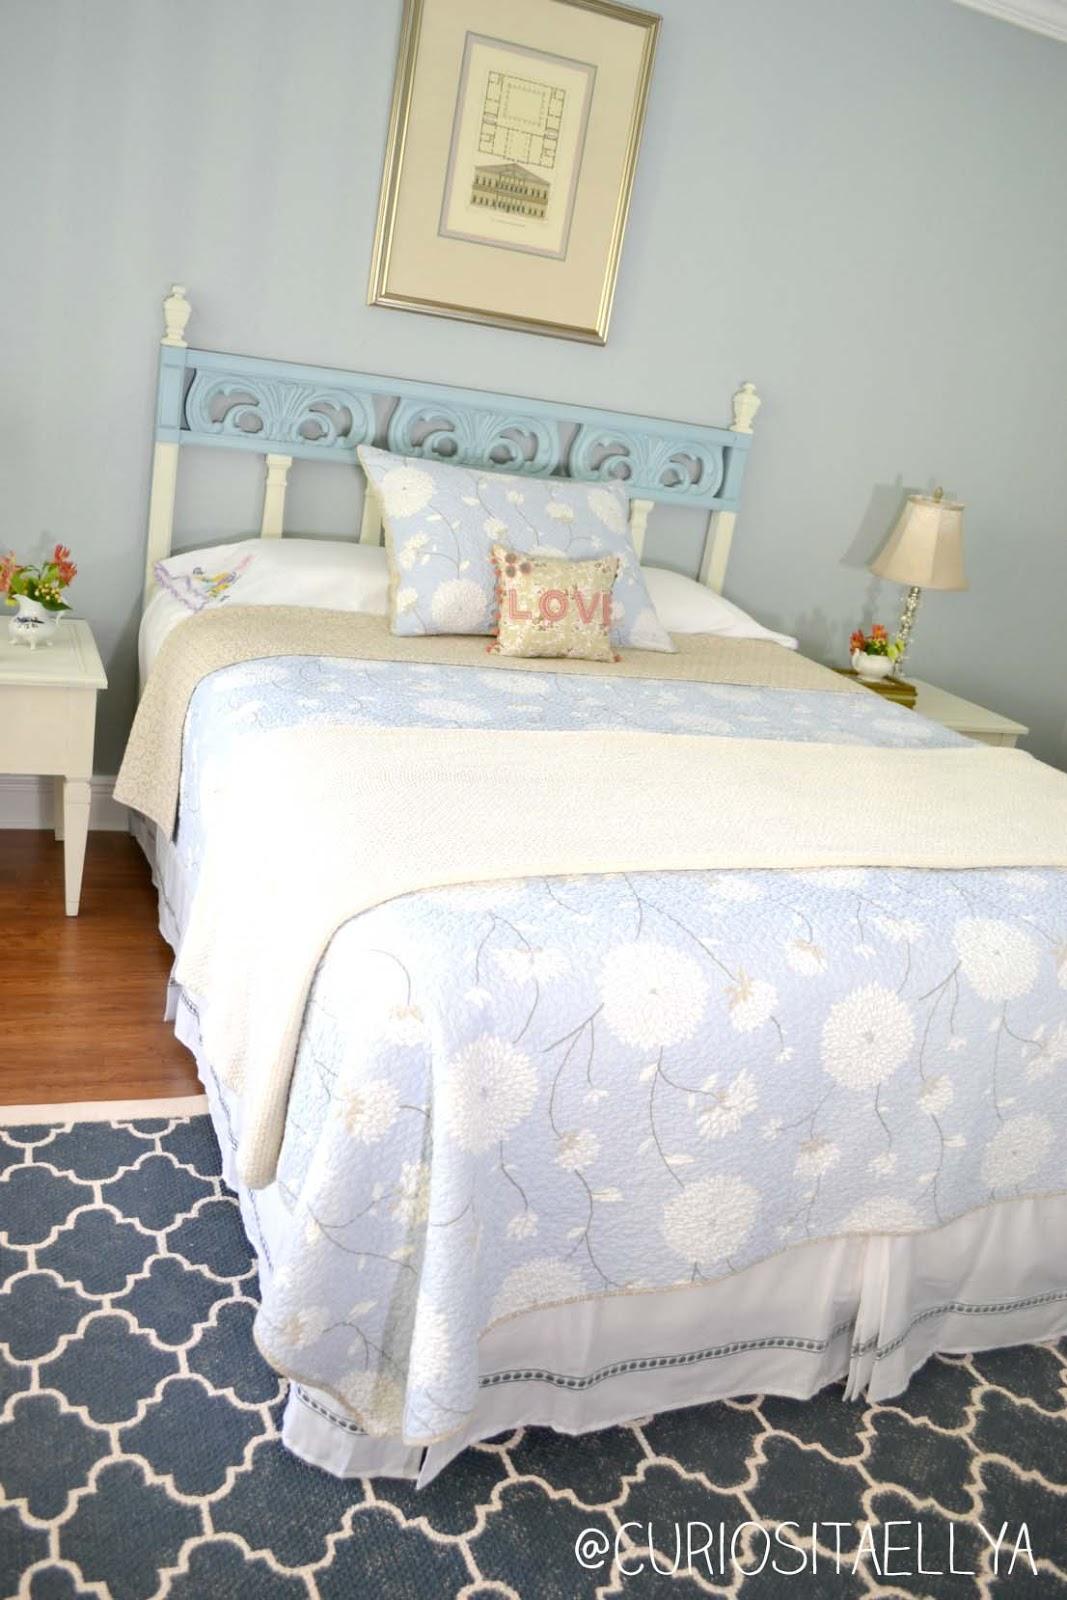 curiositaellya guest bedroom furniture makeover diy